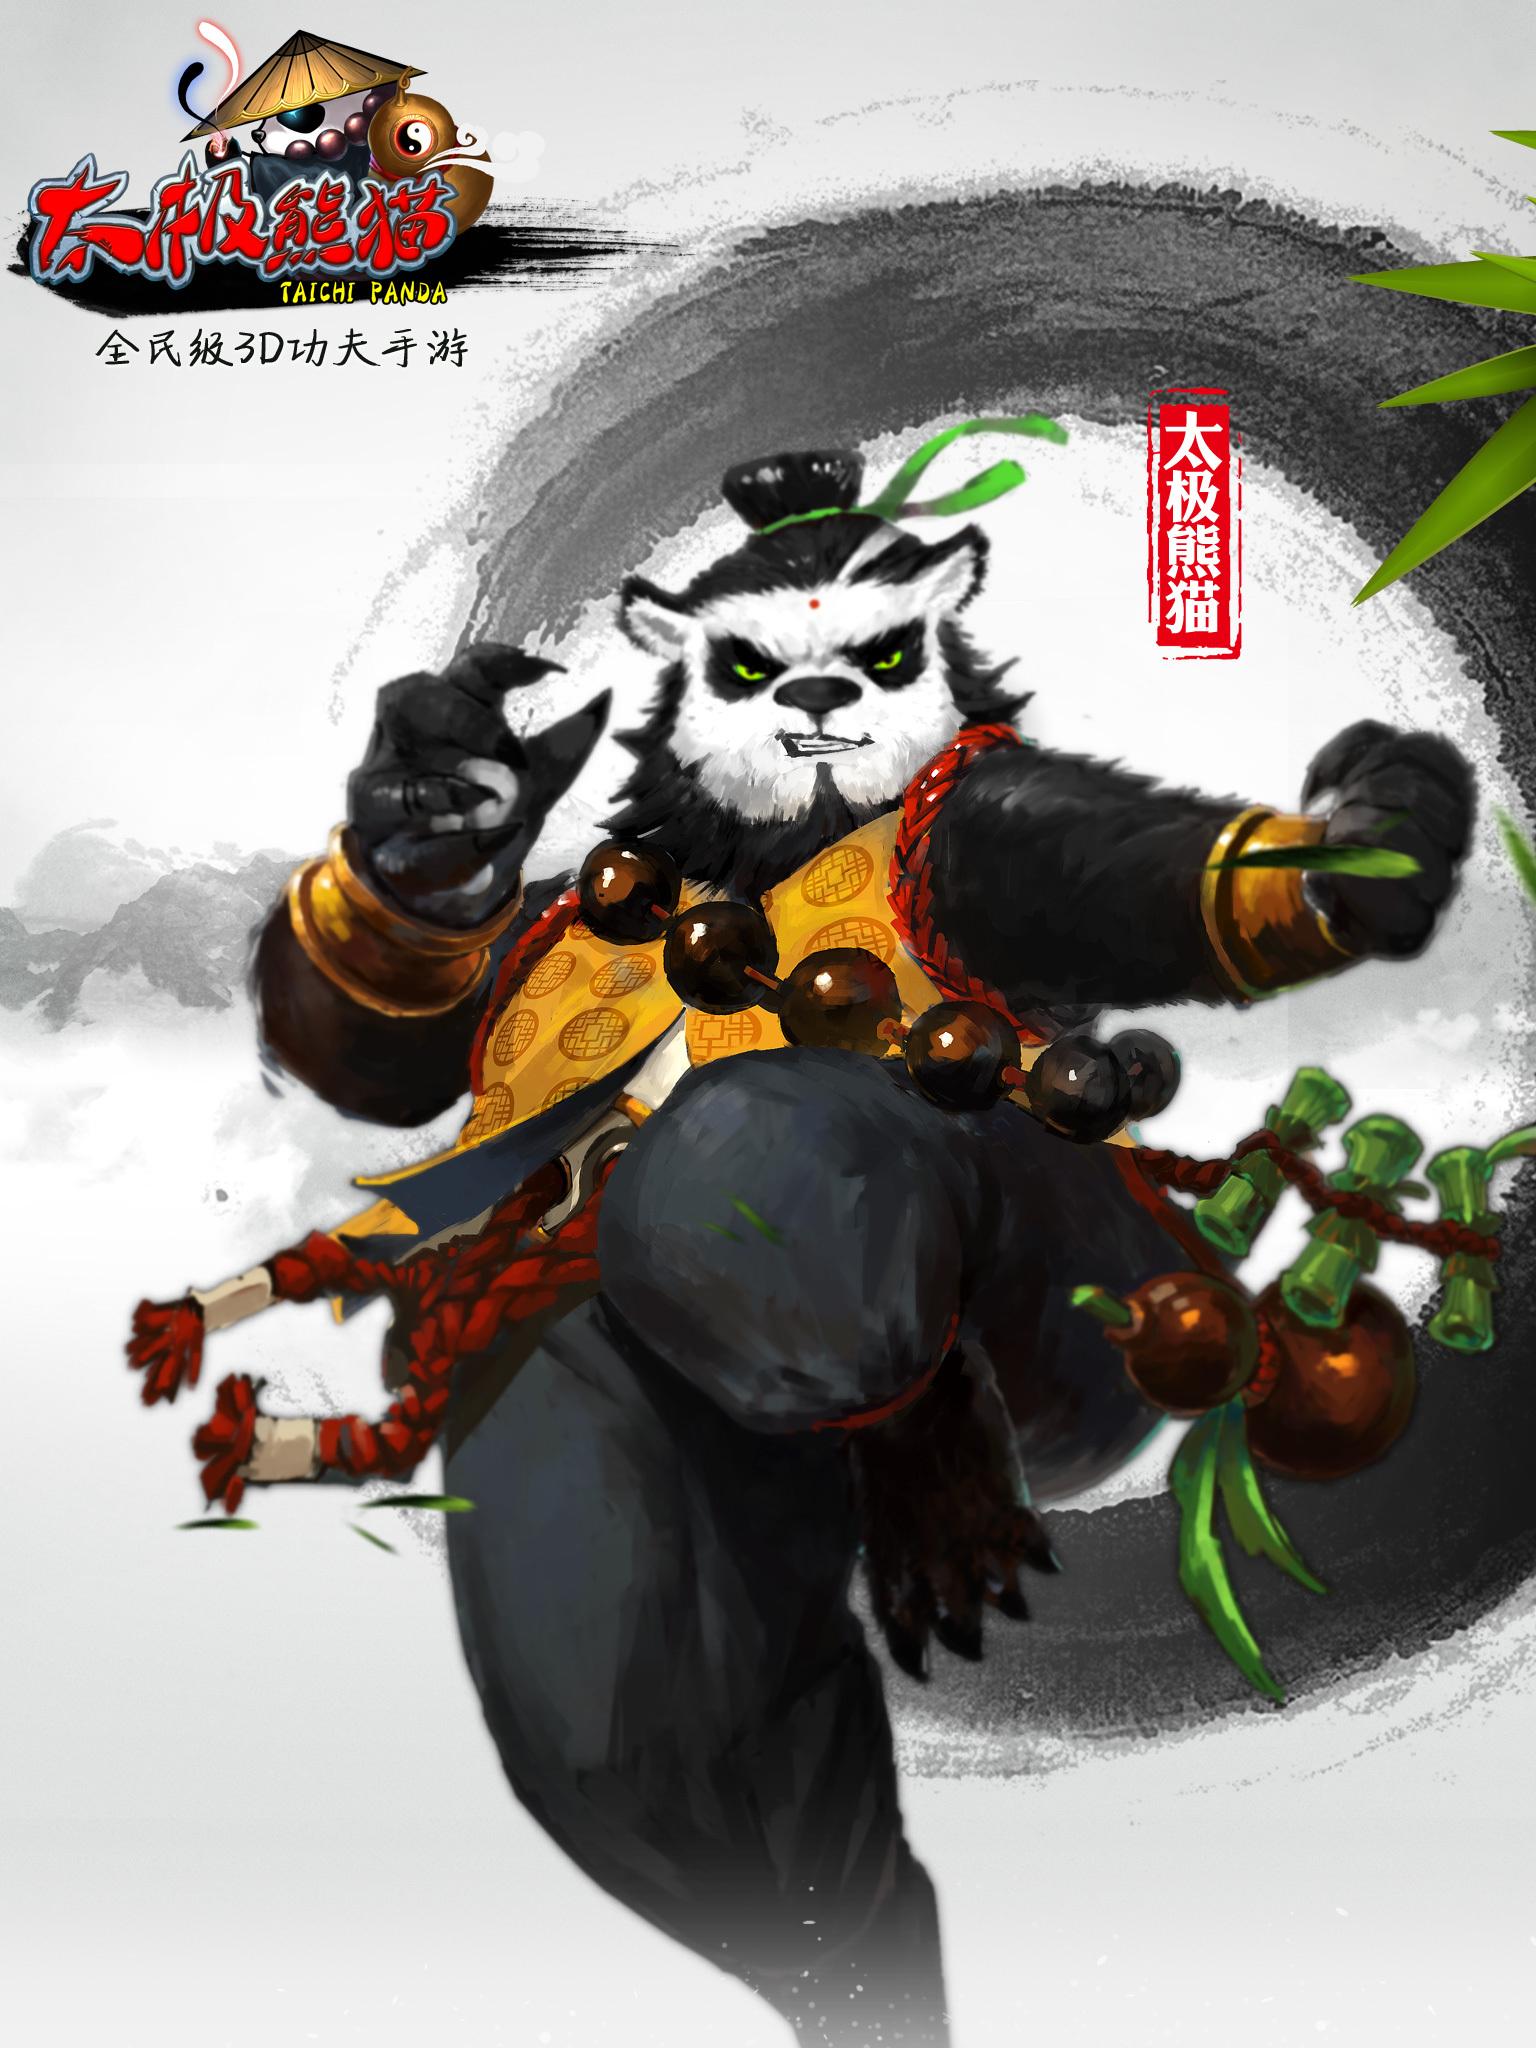 ipadmini2壁纸:1536x2048_360太极熊猫图集_360游戏